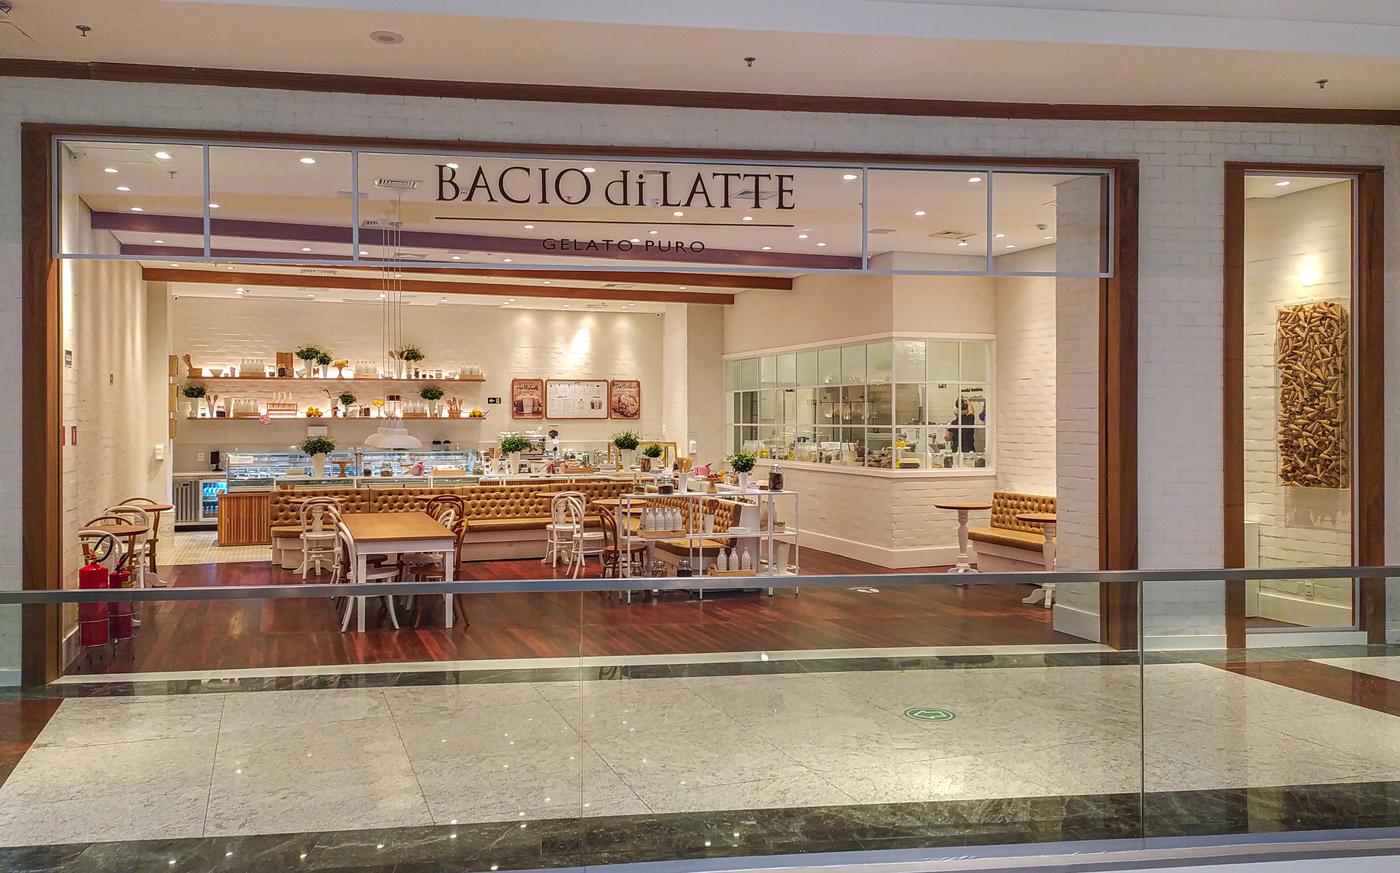 Bacio di Latte inaugura unidade no Shopping Iguatemi Fortaleza. Vem saber!